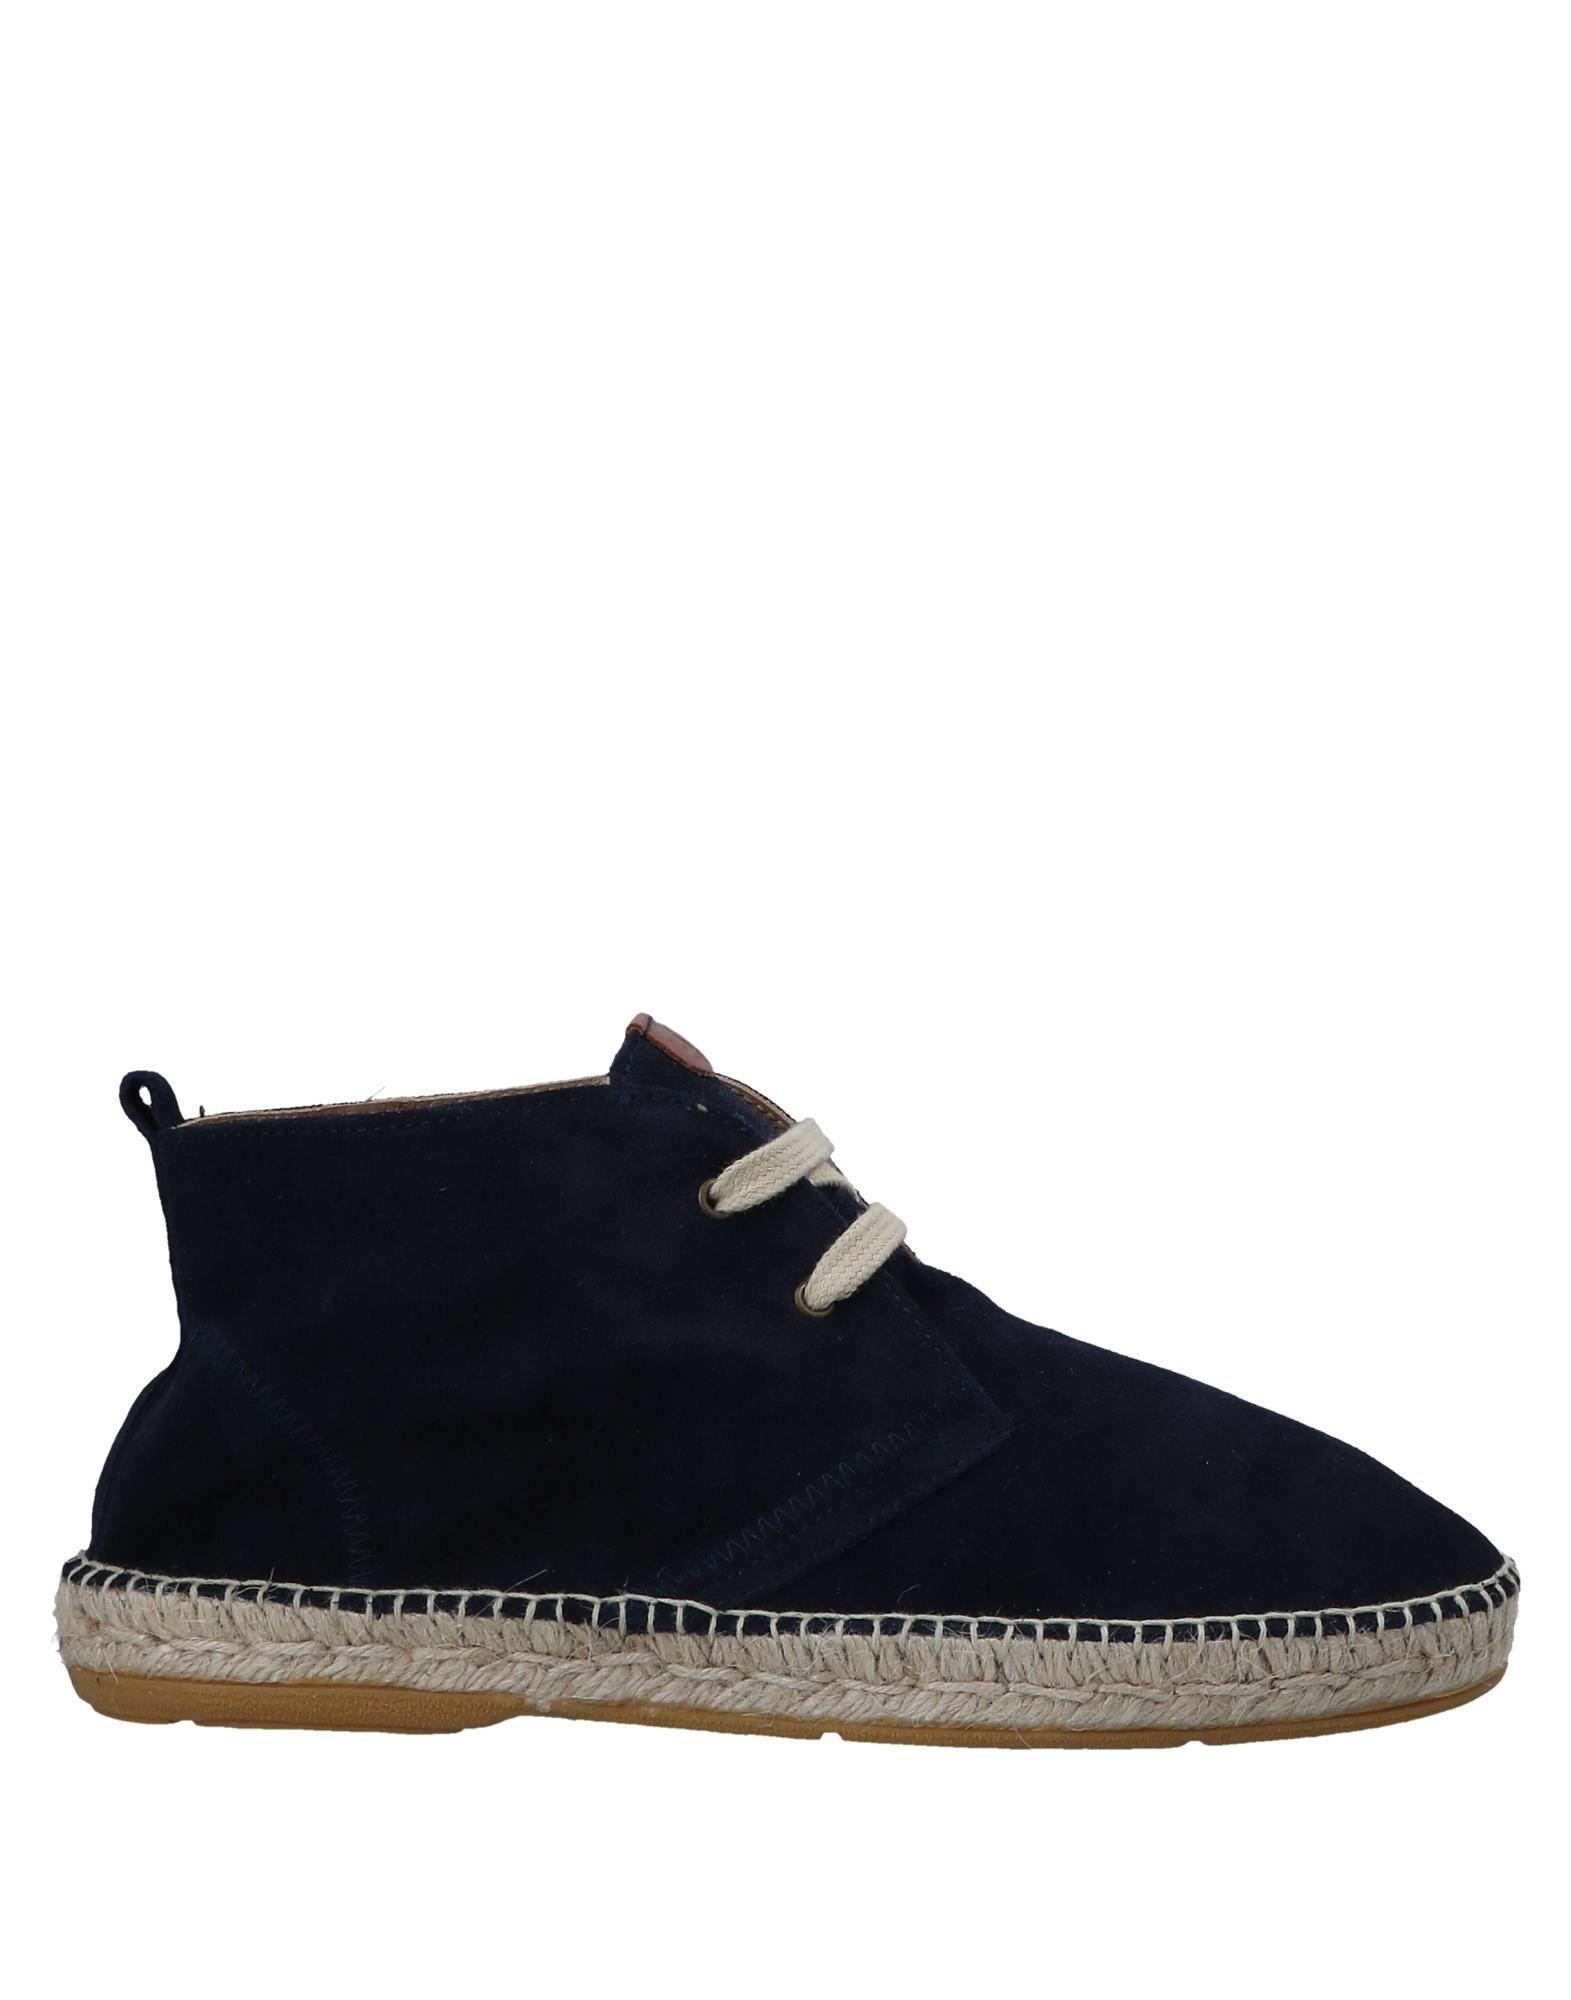 Rabatt echte Schuhe Espadrilles Espadrilles Herren  11556878GS